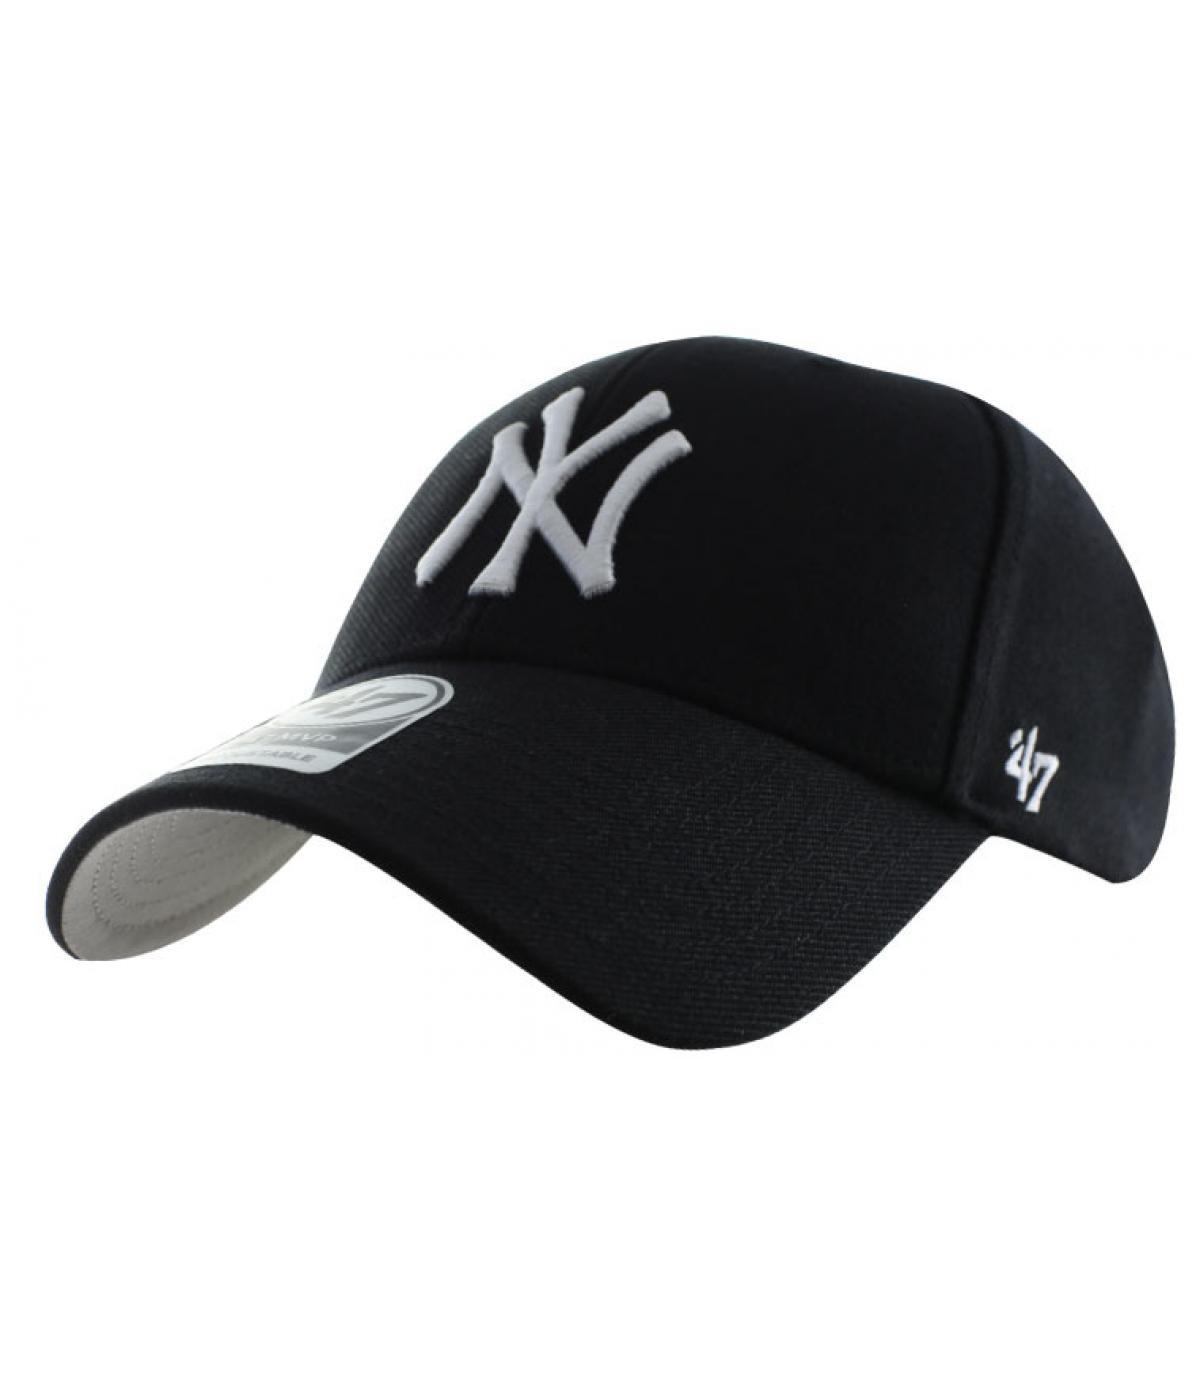 Détails MVP NY Yankees black - image 2